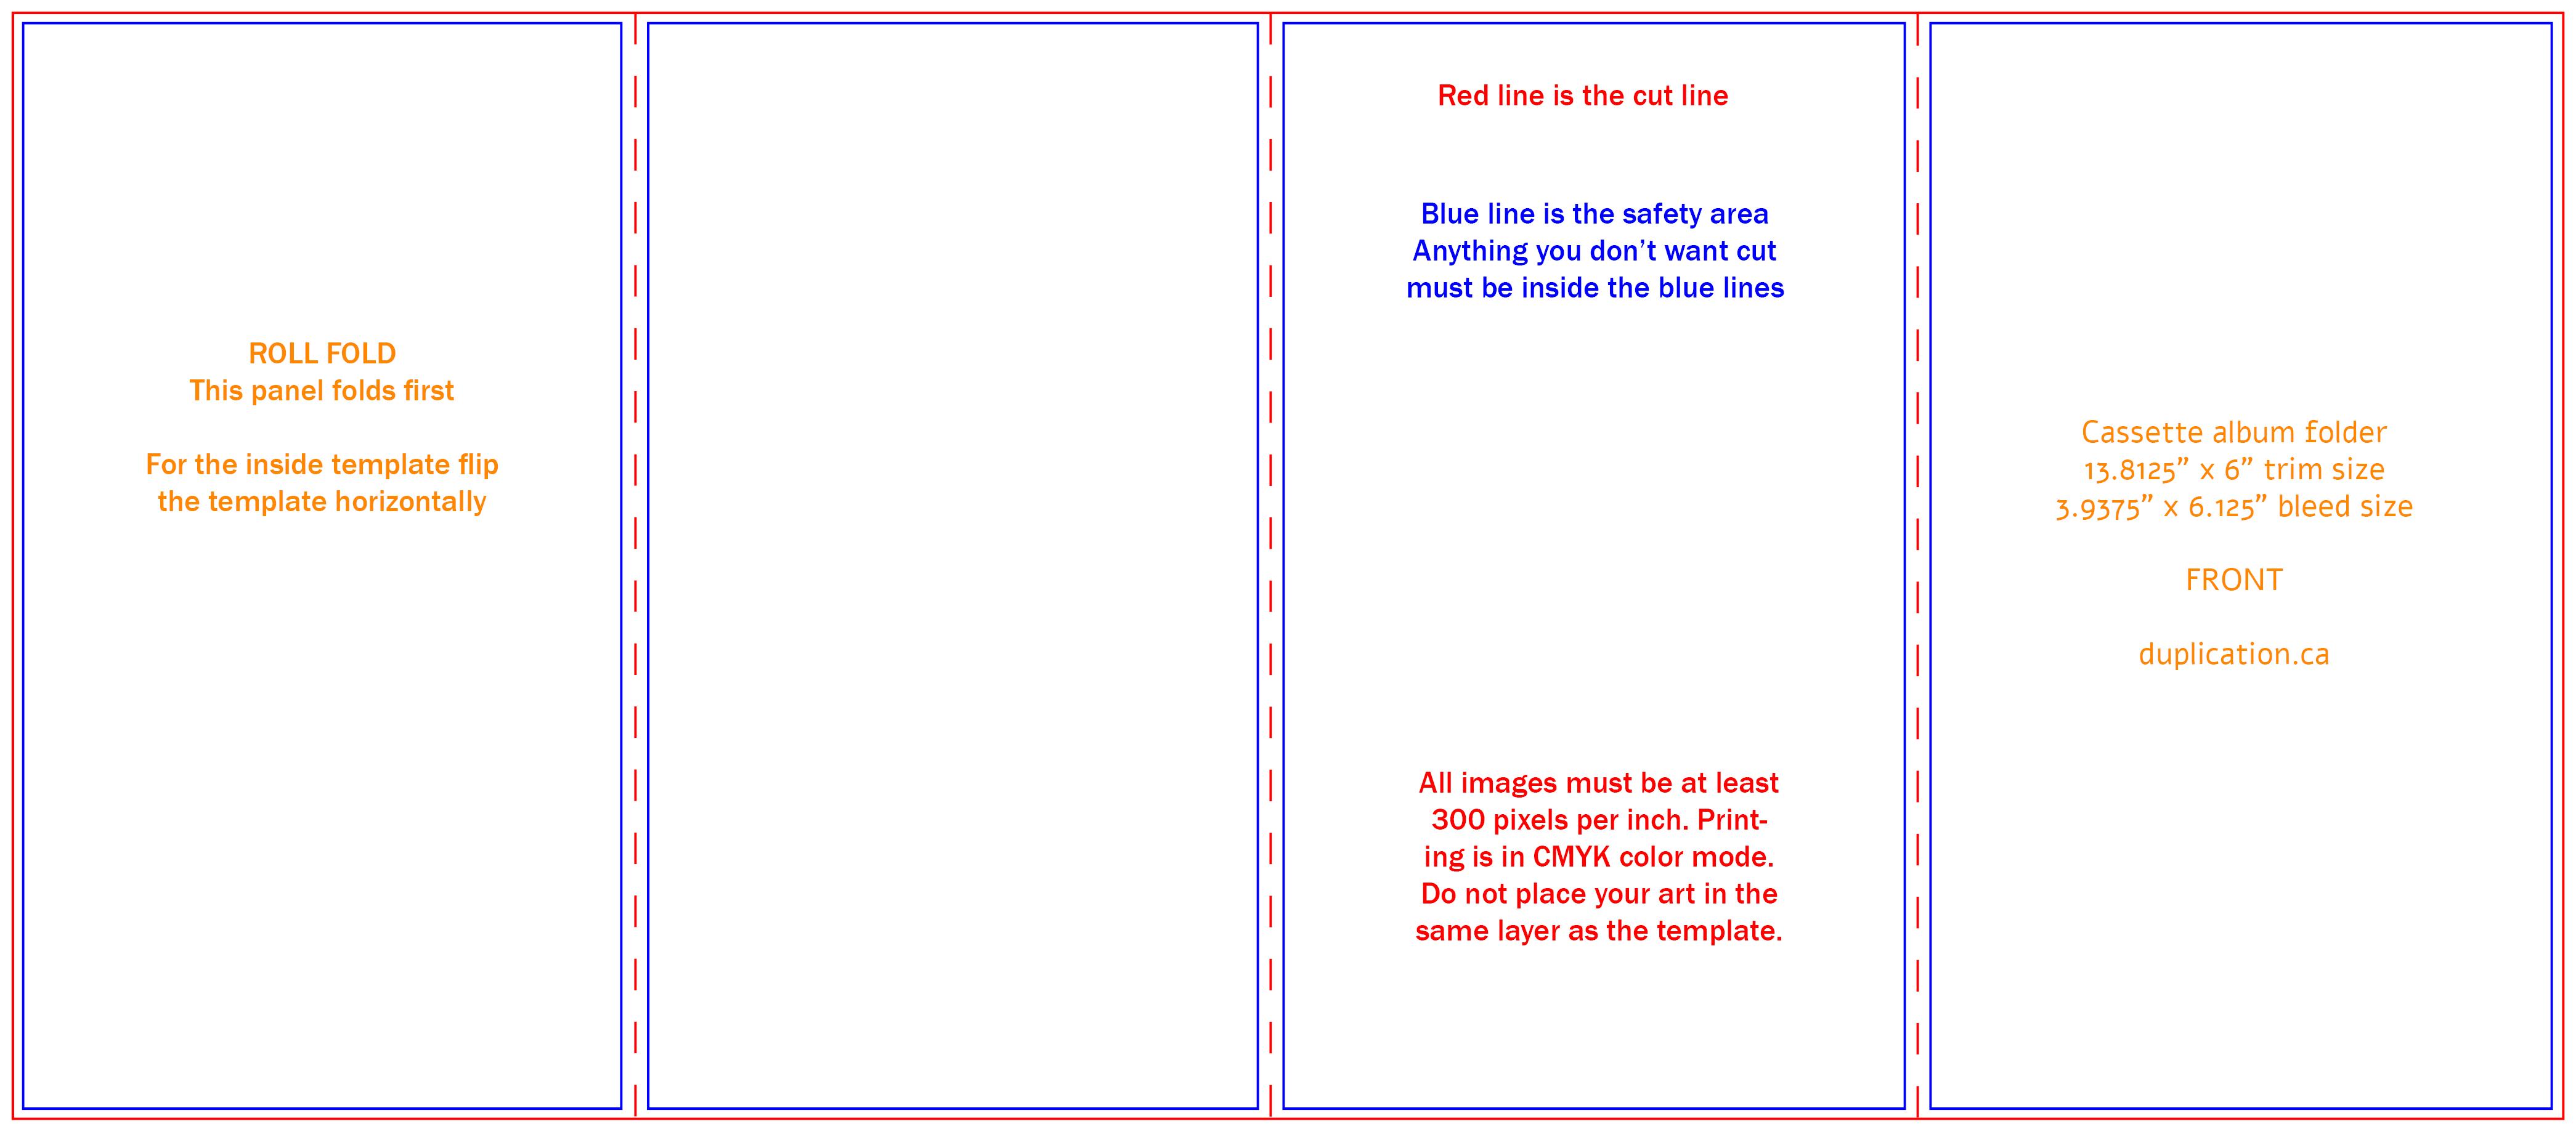 68 Create J Card Template Gimp for Ms Word with J Card Template Gimp